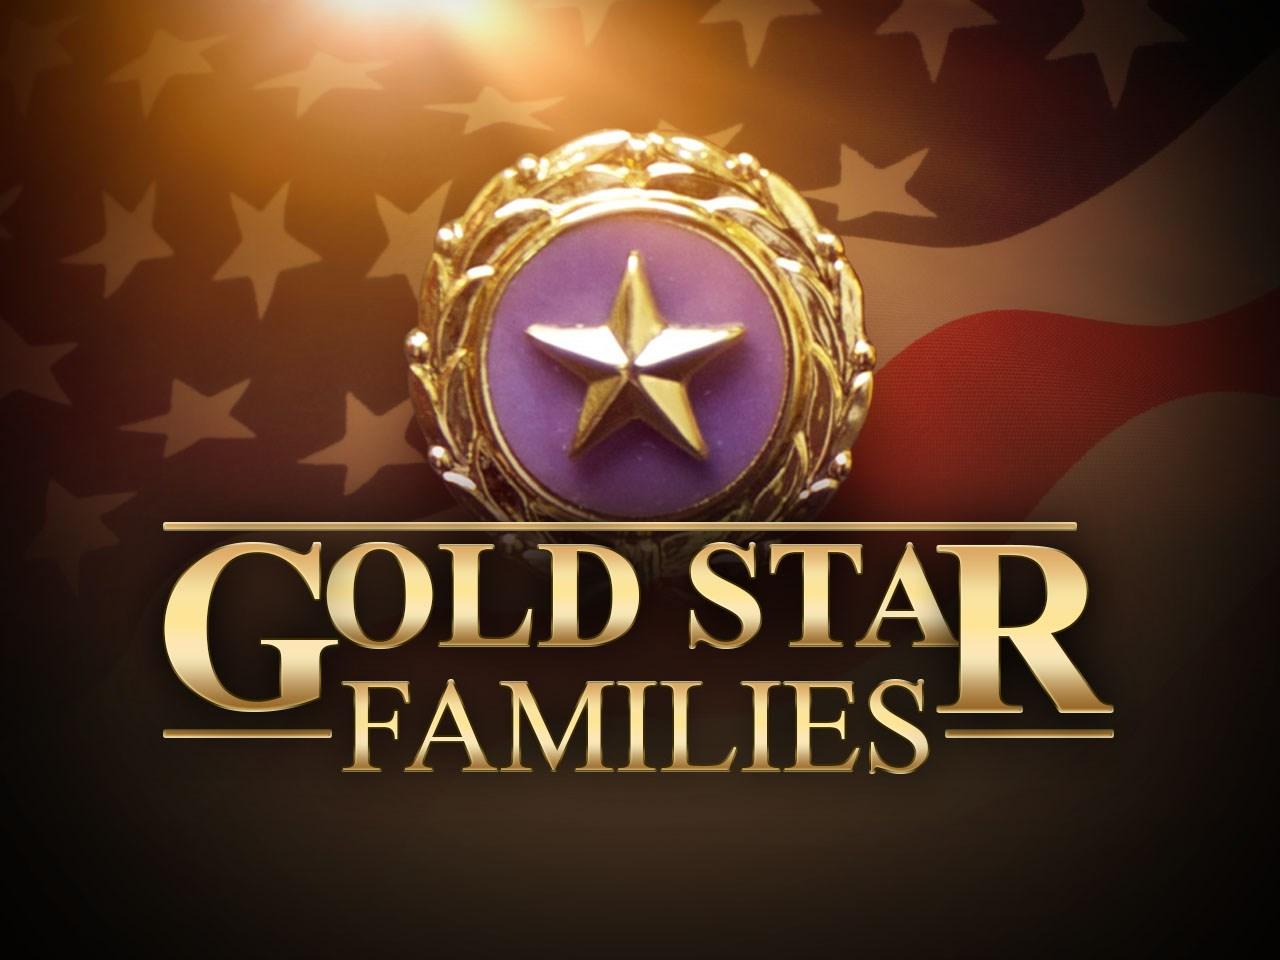 Gold Star Families _1523290333326.jpg.jpg